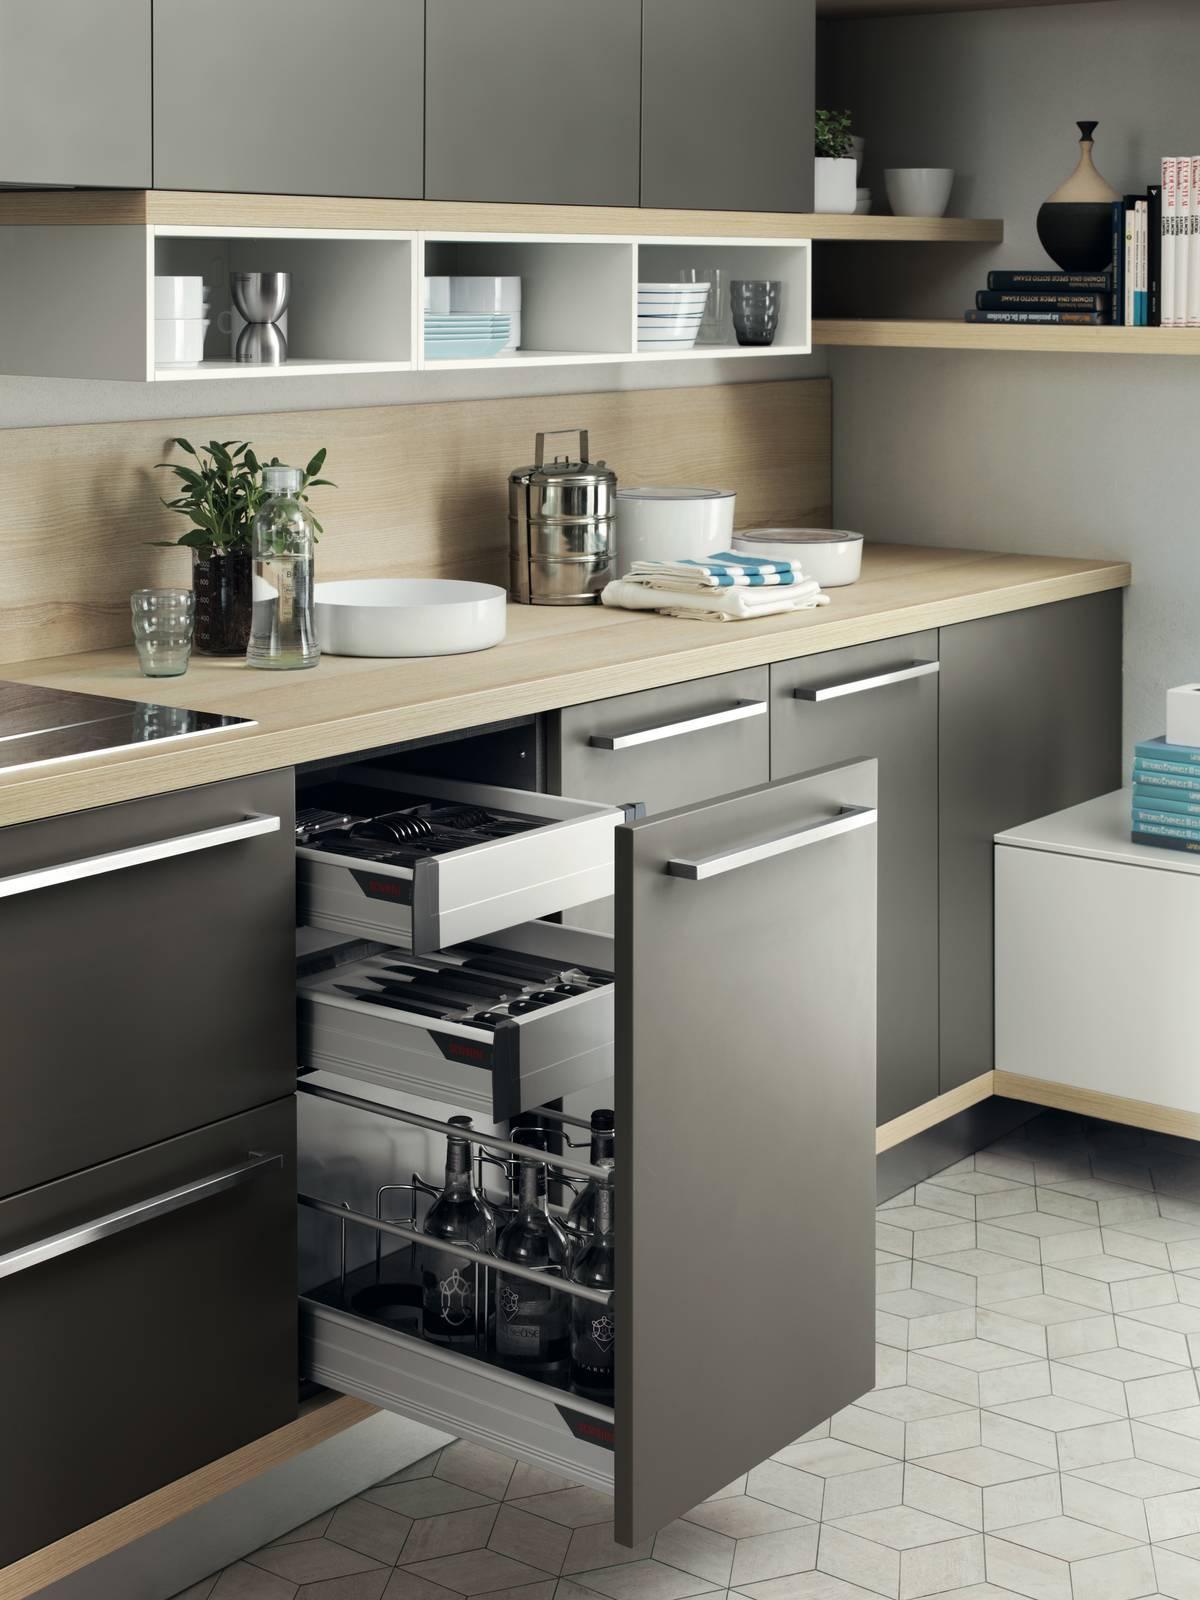 Cassetti, cassettoni, cestoni: la praticità in cucina - Cose di Casa